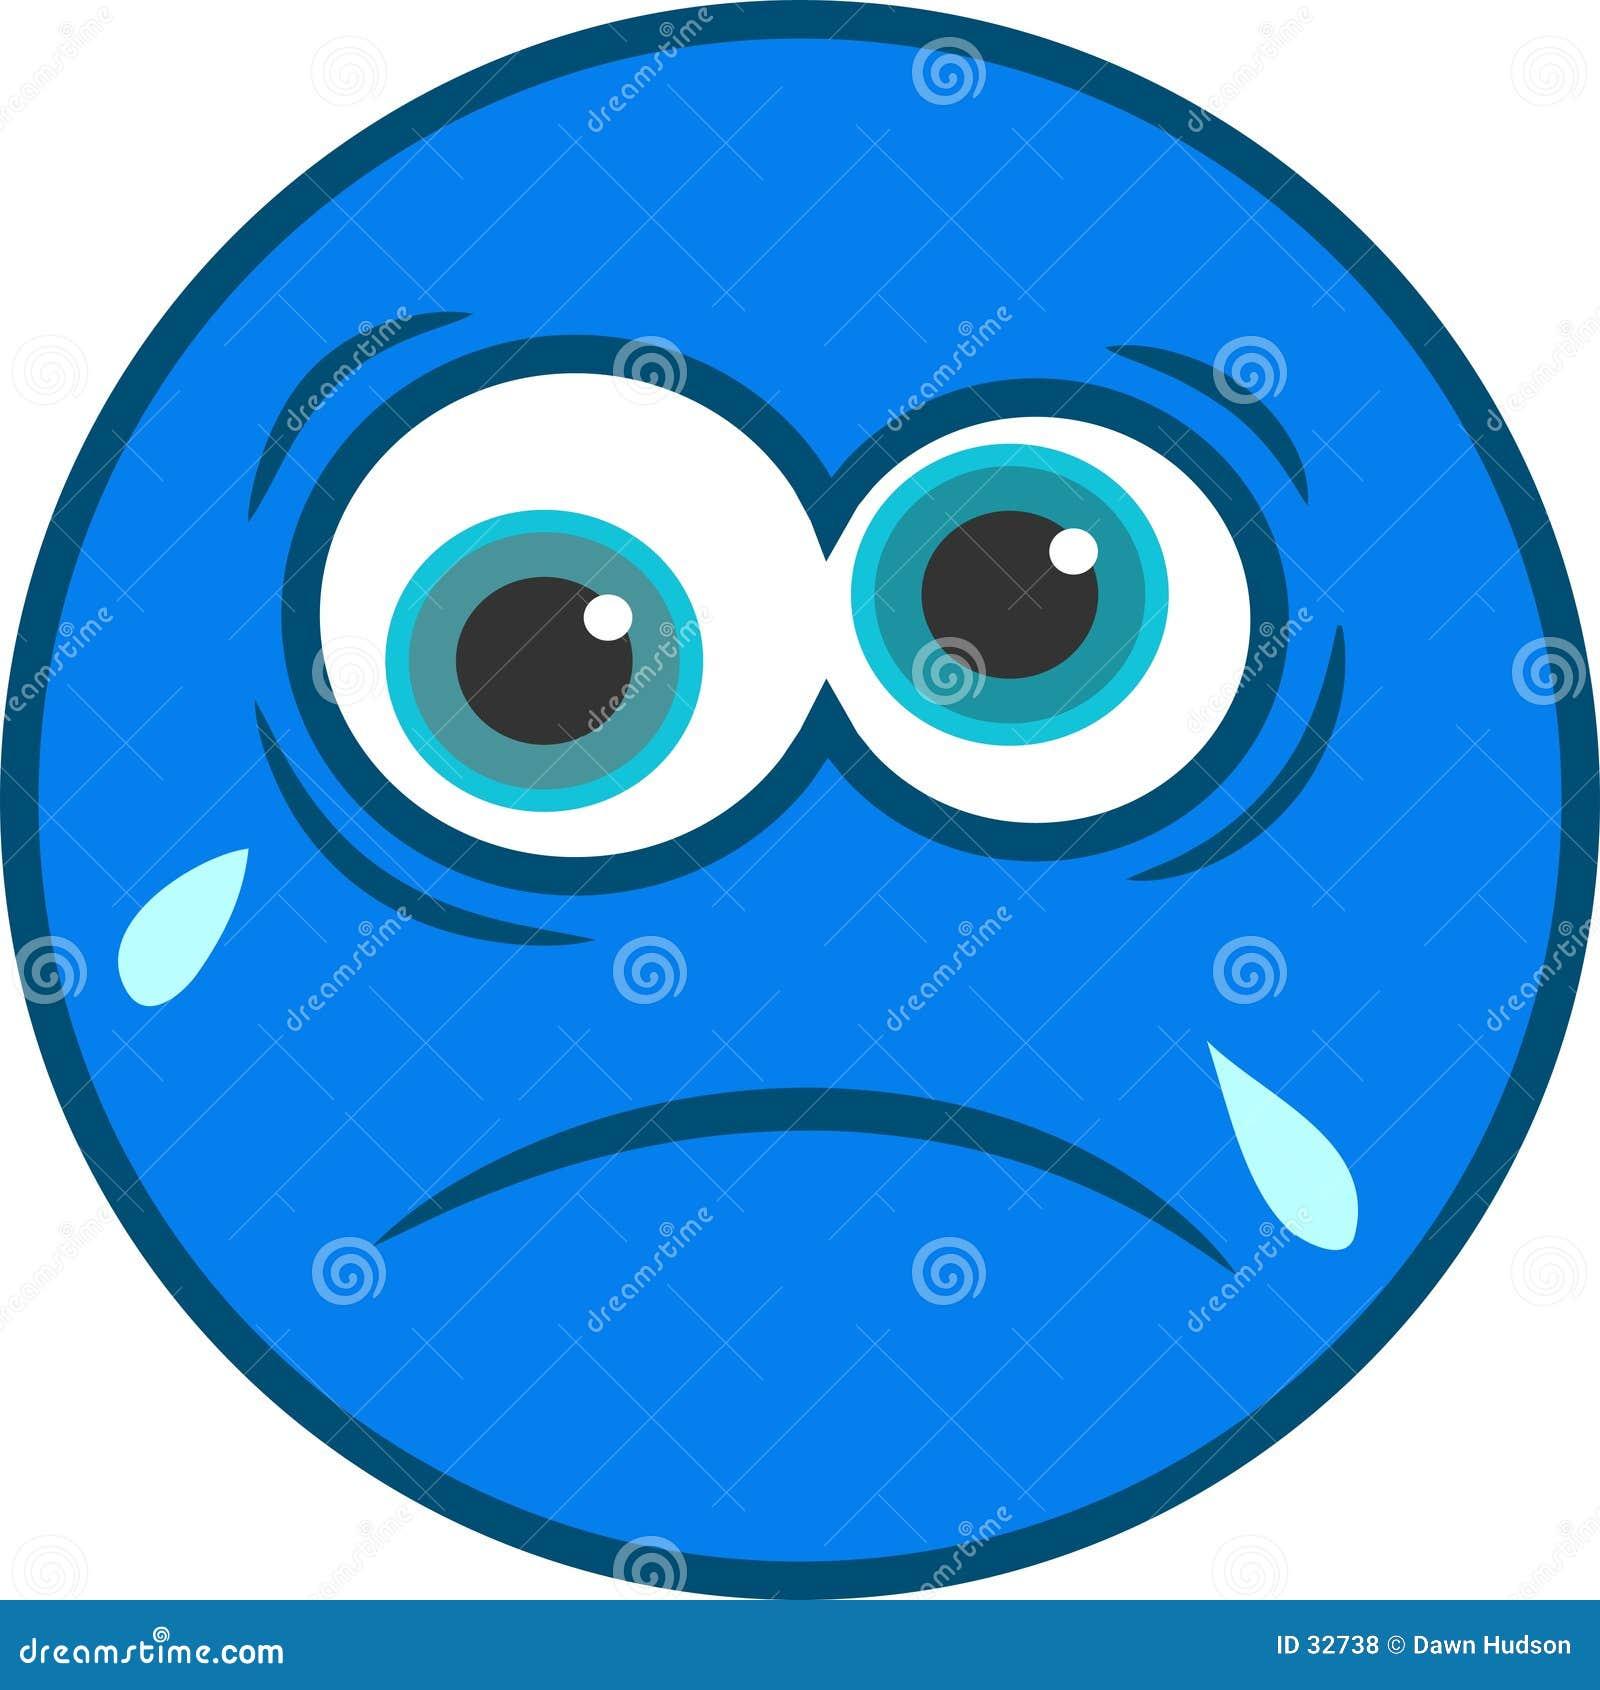 Sad Smiley Icon Royalty Free Stock Photos - Image: 32738 Wow Face Clip Art